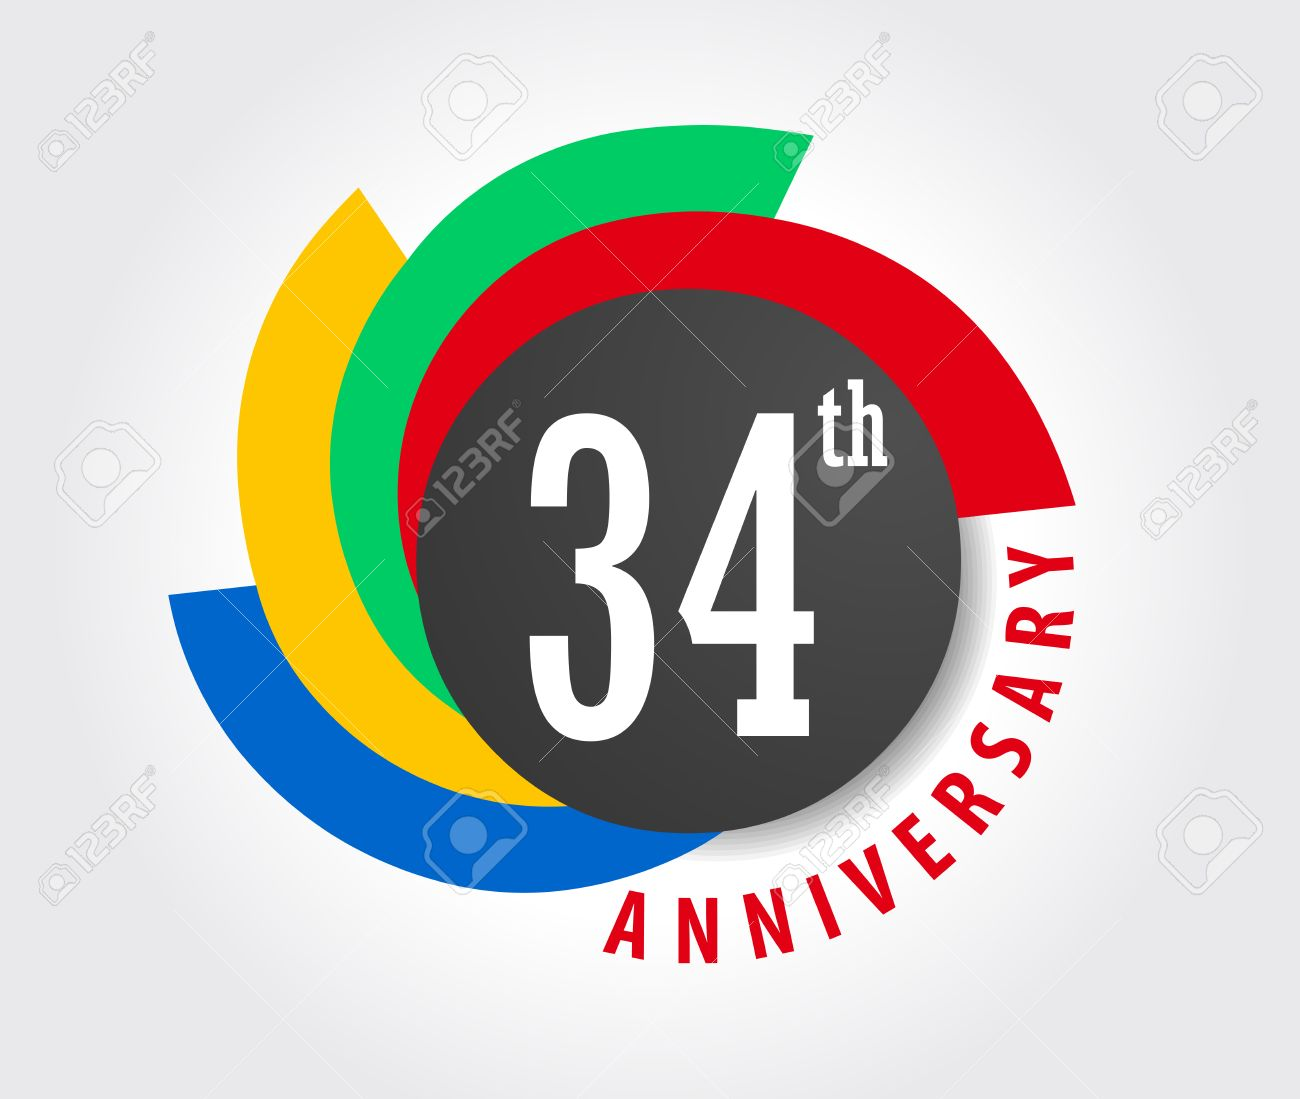 34th Anniversary celebration background, 34 years anniversary card illustration - 59937288